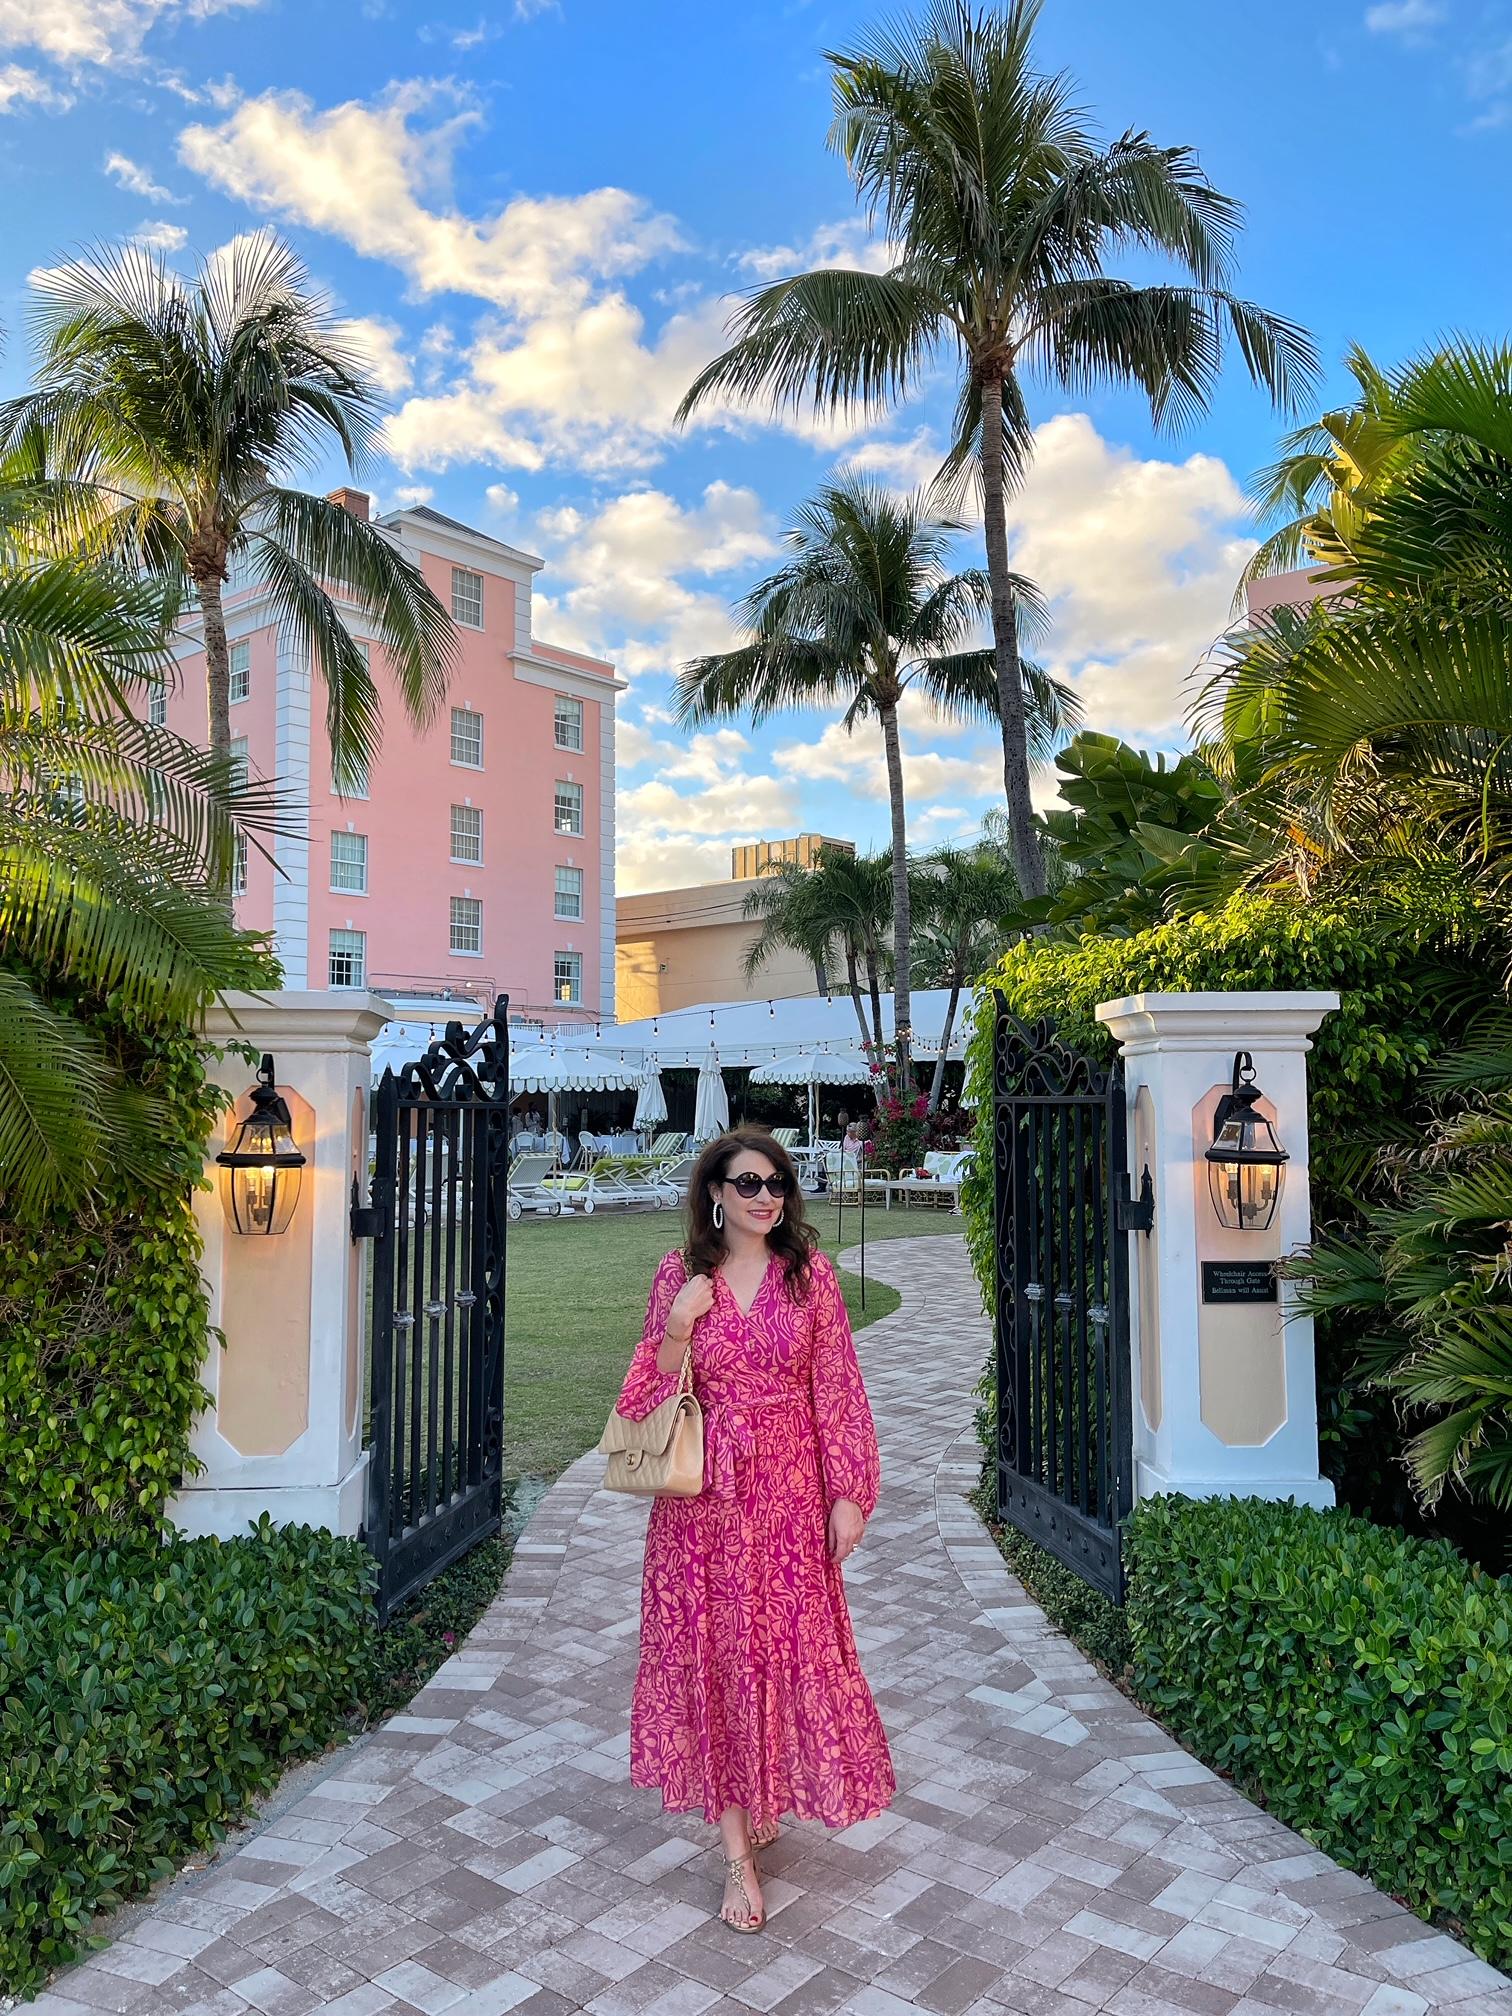 the colony hotel, palm beach, the-alyst.com